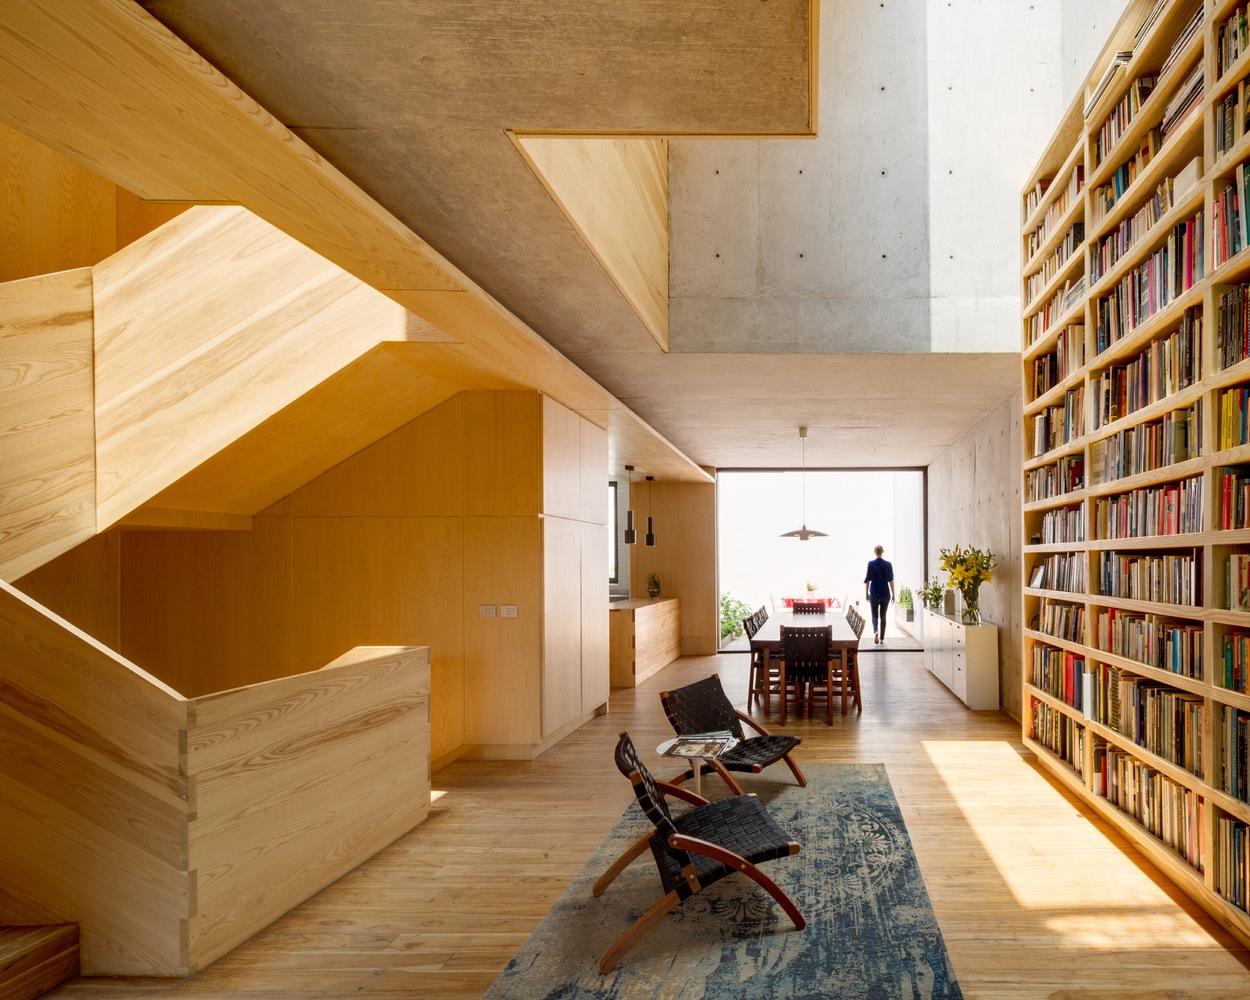 RIBA Announces 2018 RIBA International Prize Longlist For Worldu0027s Best  Building,Cuernavaca House; Mexico